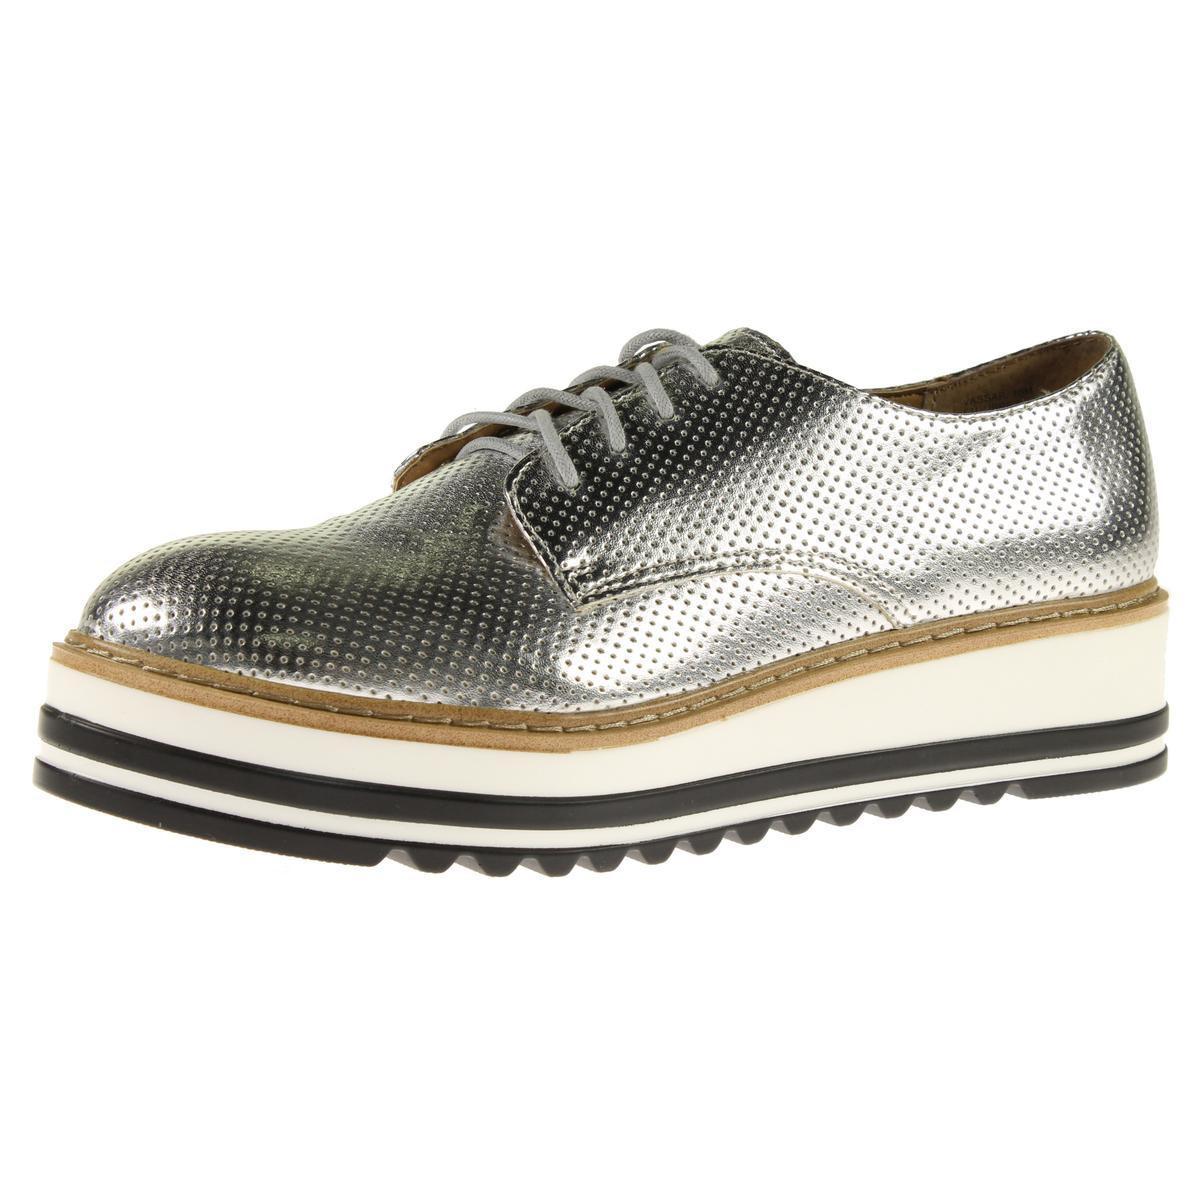 c7f6532835d Lyst - Steve Madden Vassar Faux Leather Platform Shoes in Metallic